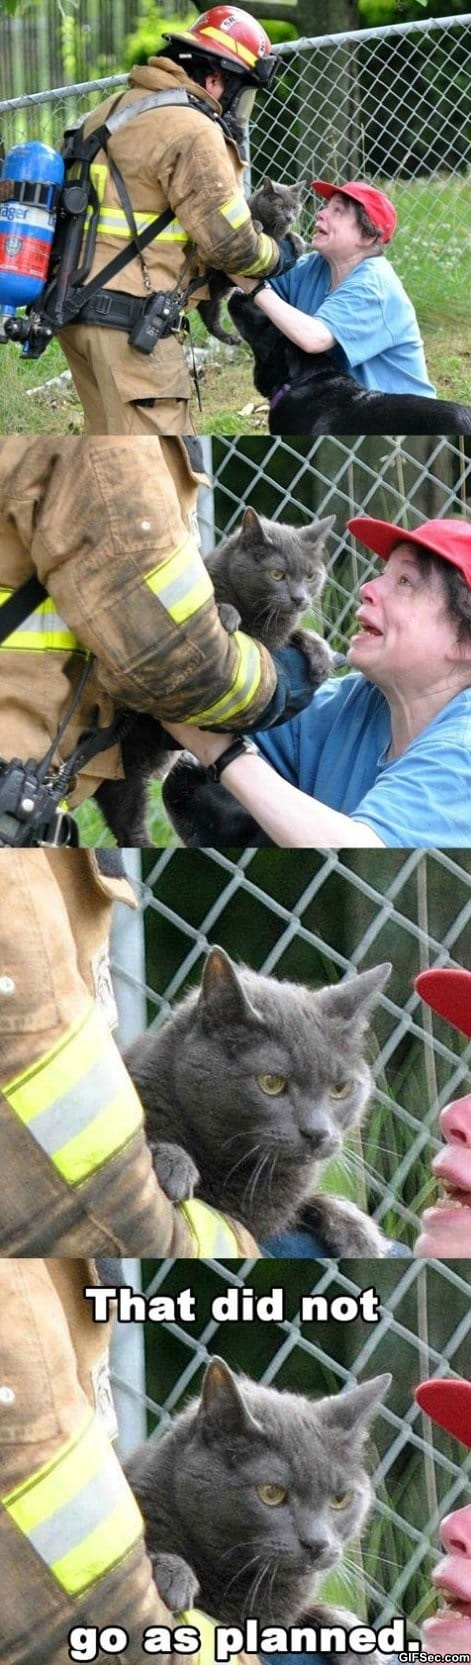 evil-cat-saved